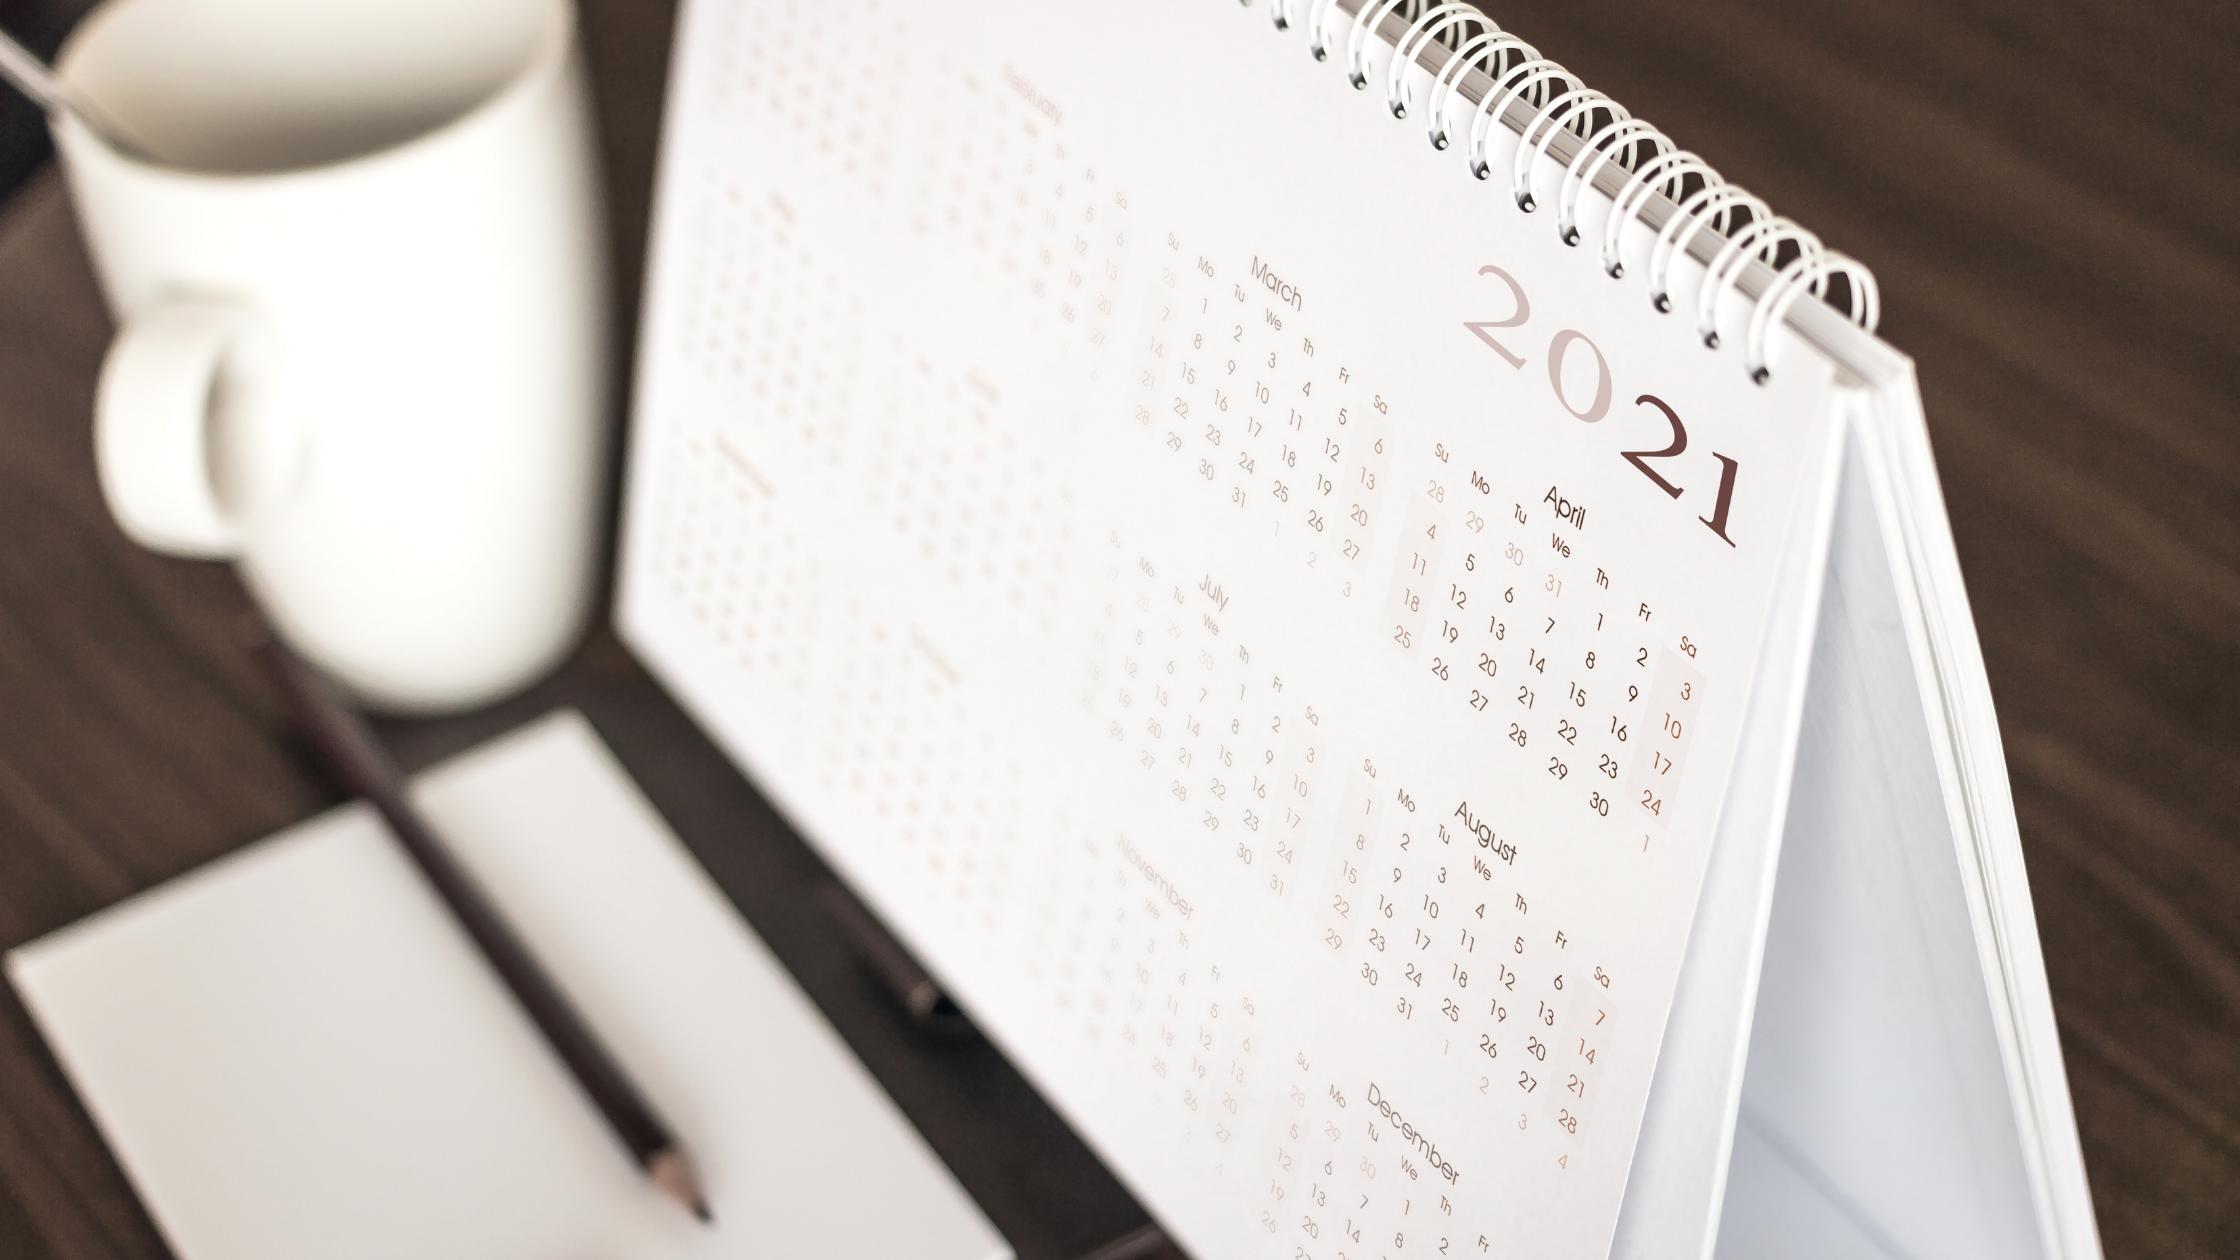 IRS postpones the filing deadline to May 17